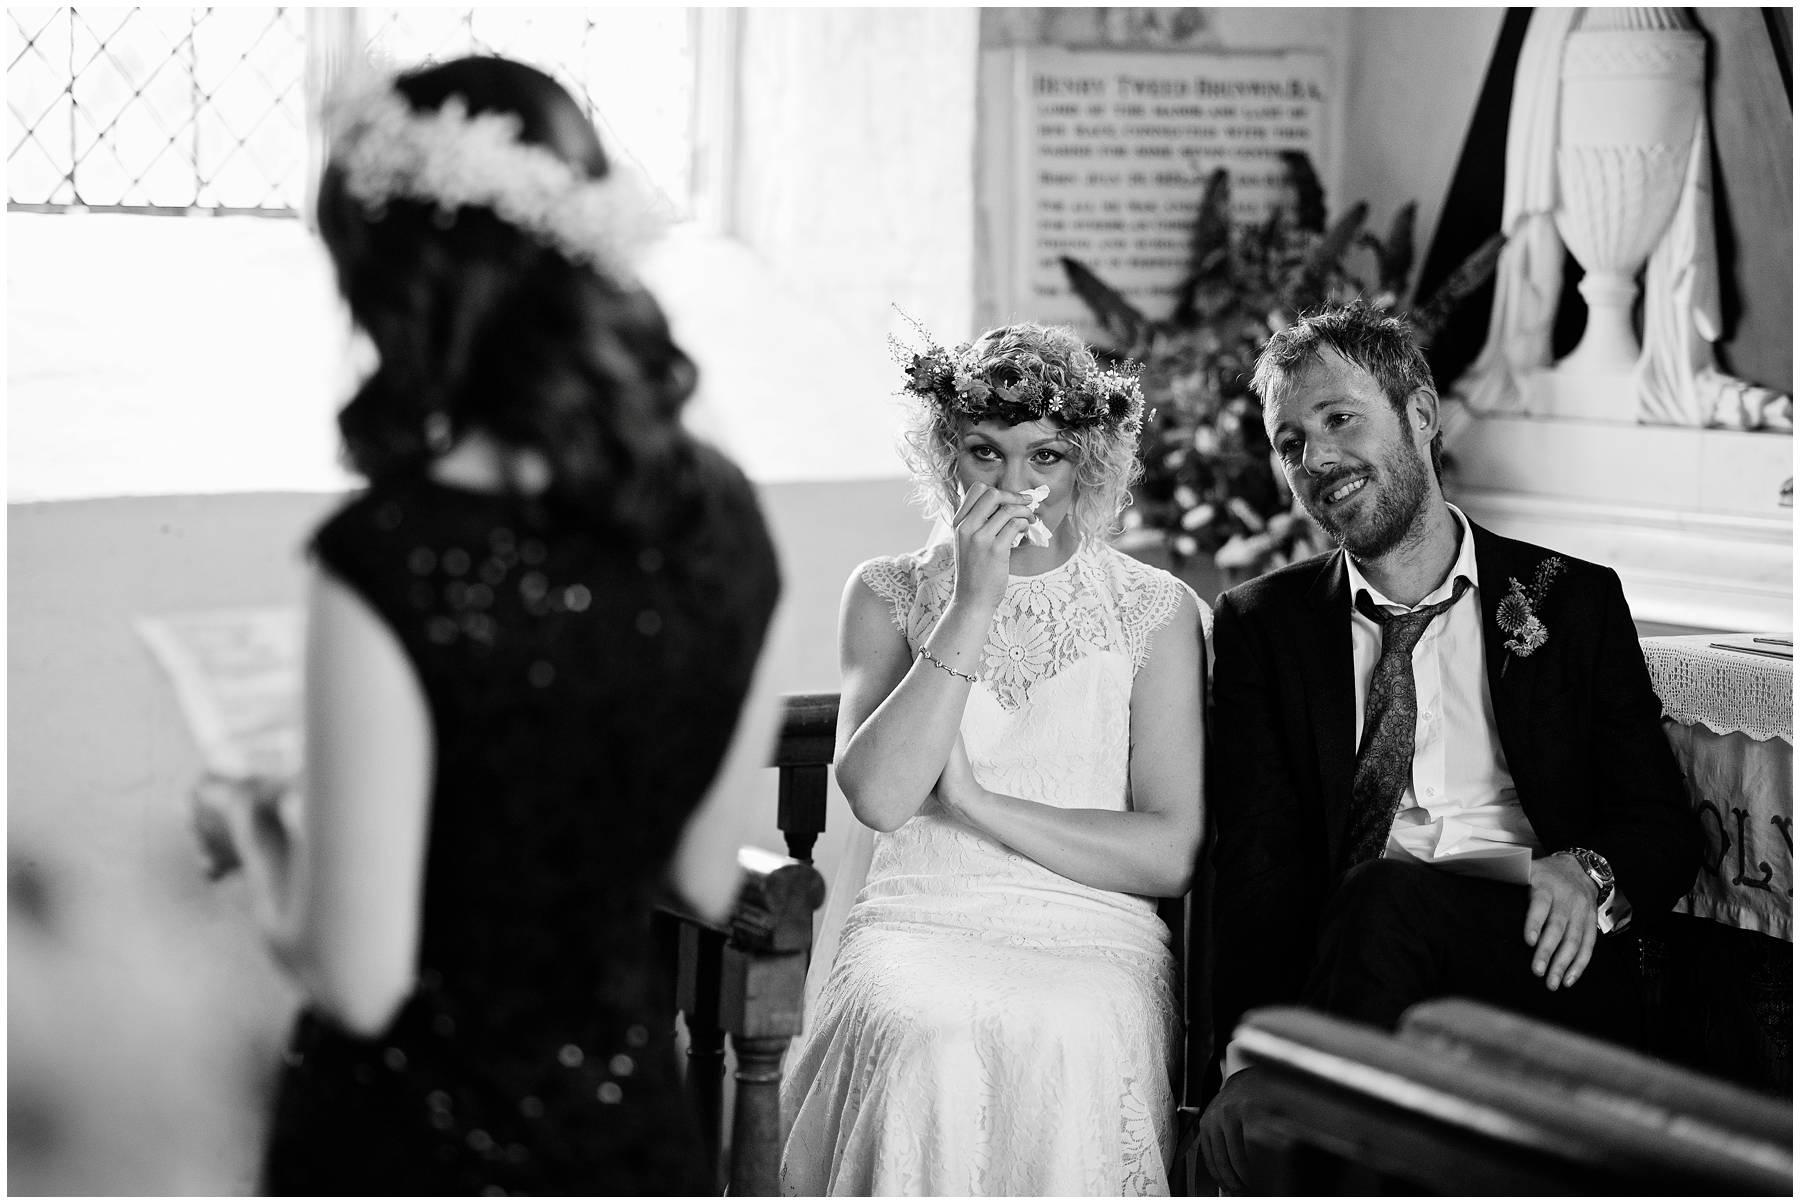 Emotional bride at Church Wedding in Essex